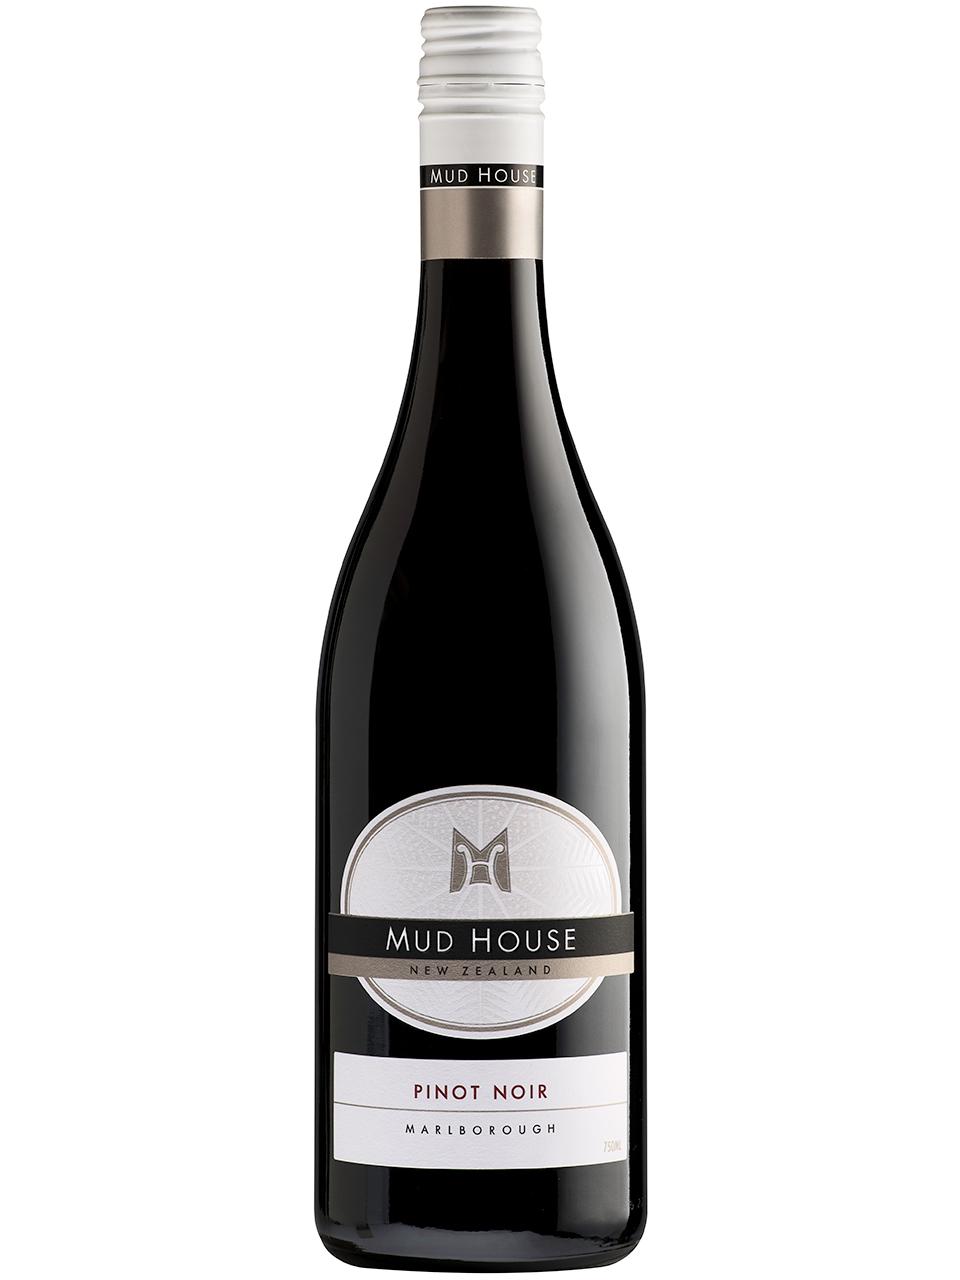 Mud House Central Otago Pinot Noir